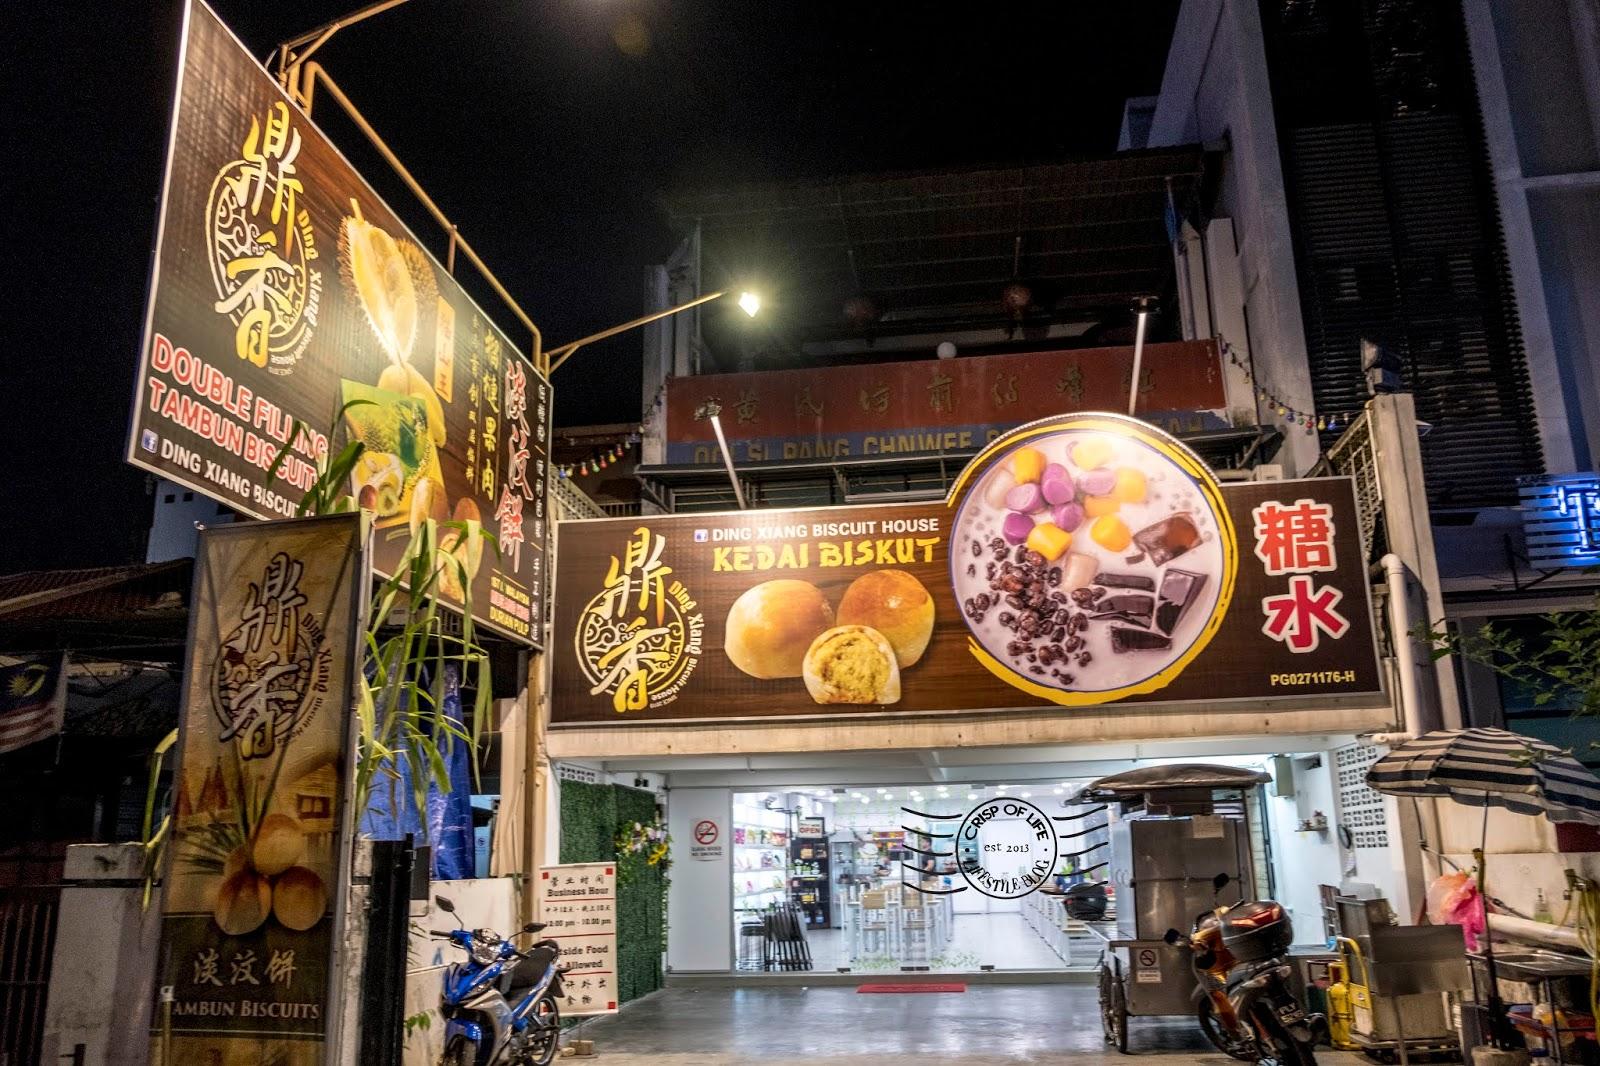 Tong Shui @ Kedai Biskuit Ding Xing, Lorong Selamat Penang